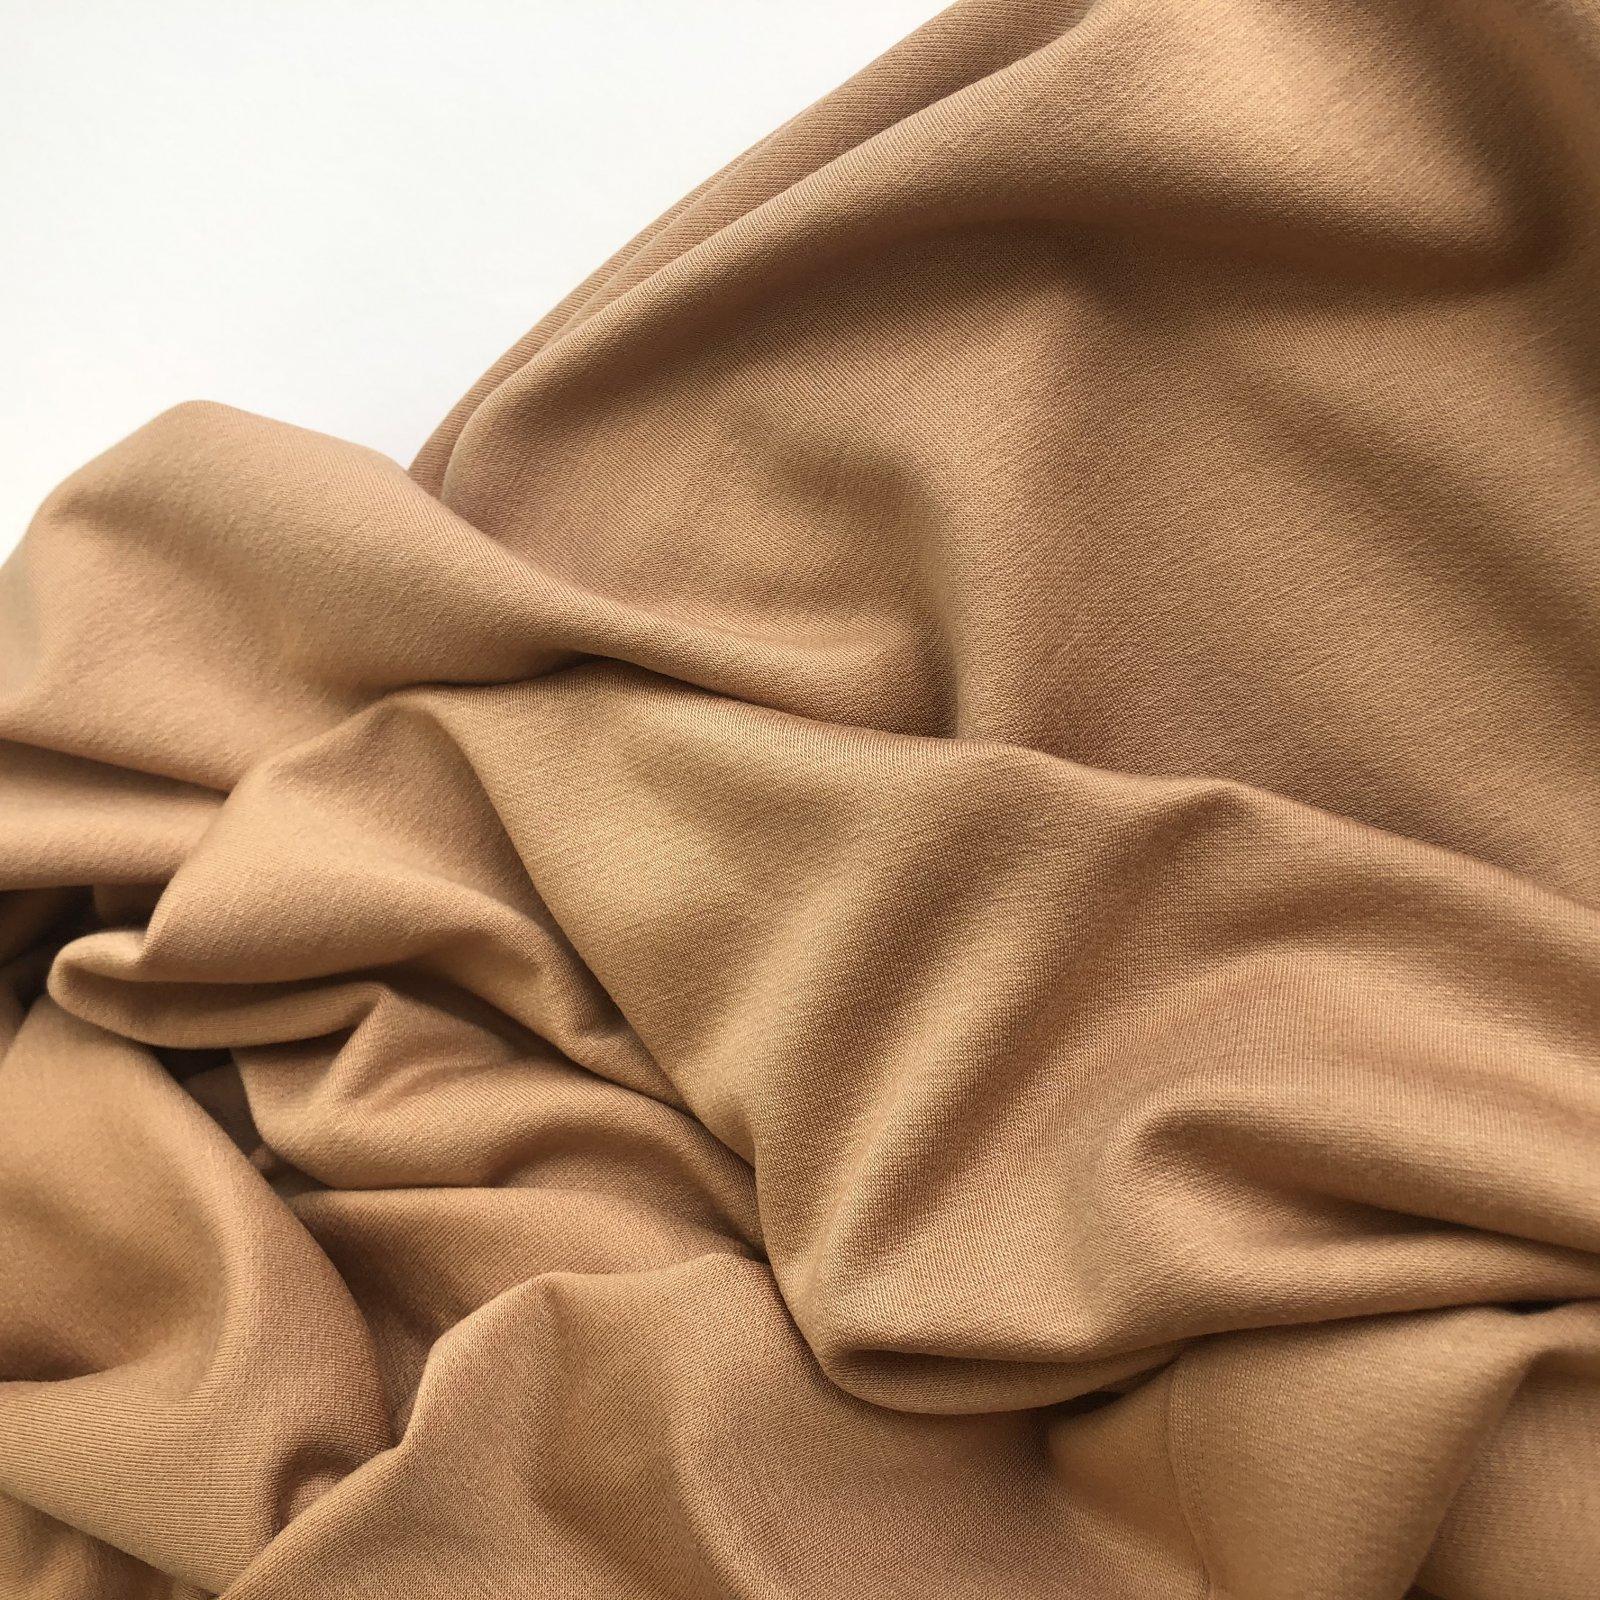 Rayon/Lycra 10 Oz Sweatshirt Fleece - Fawn